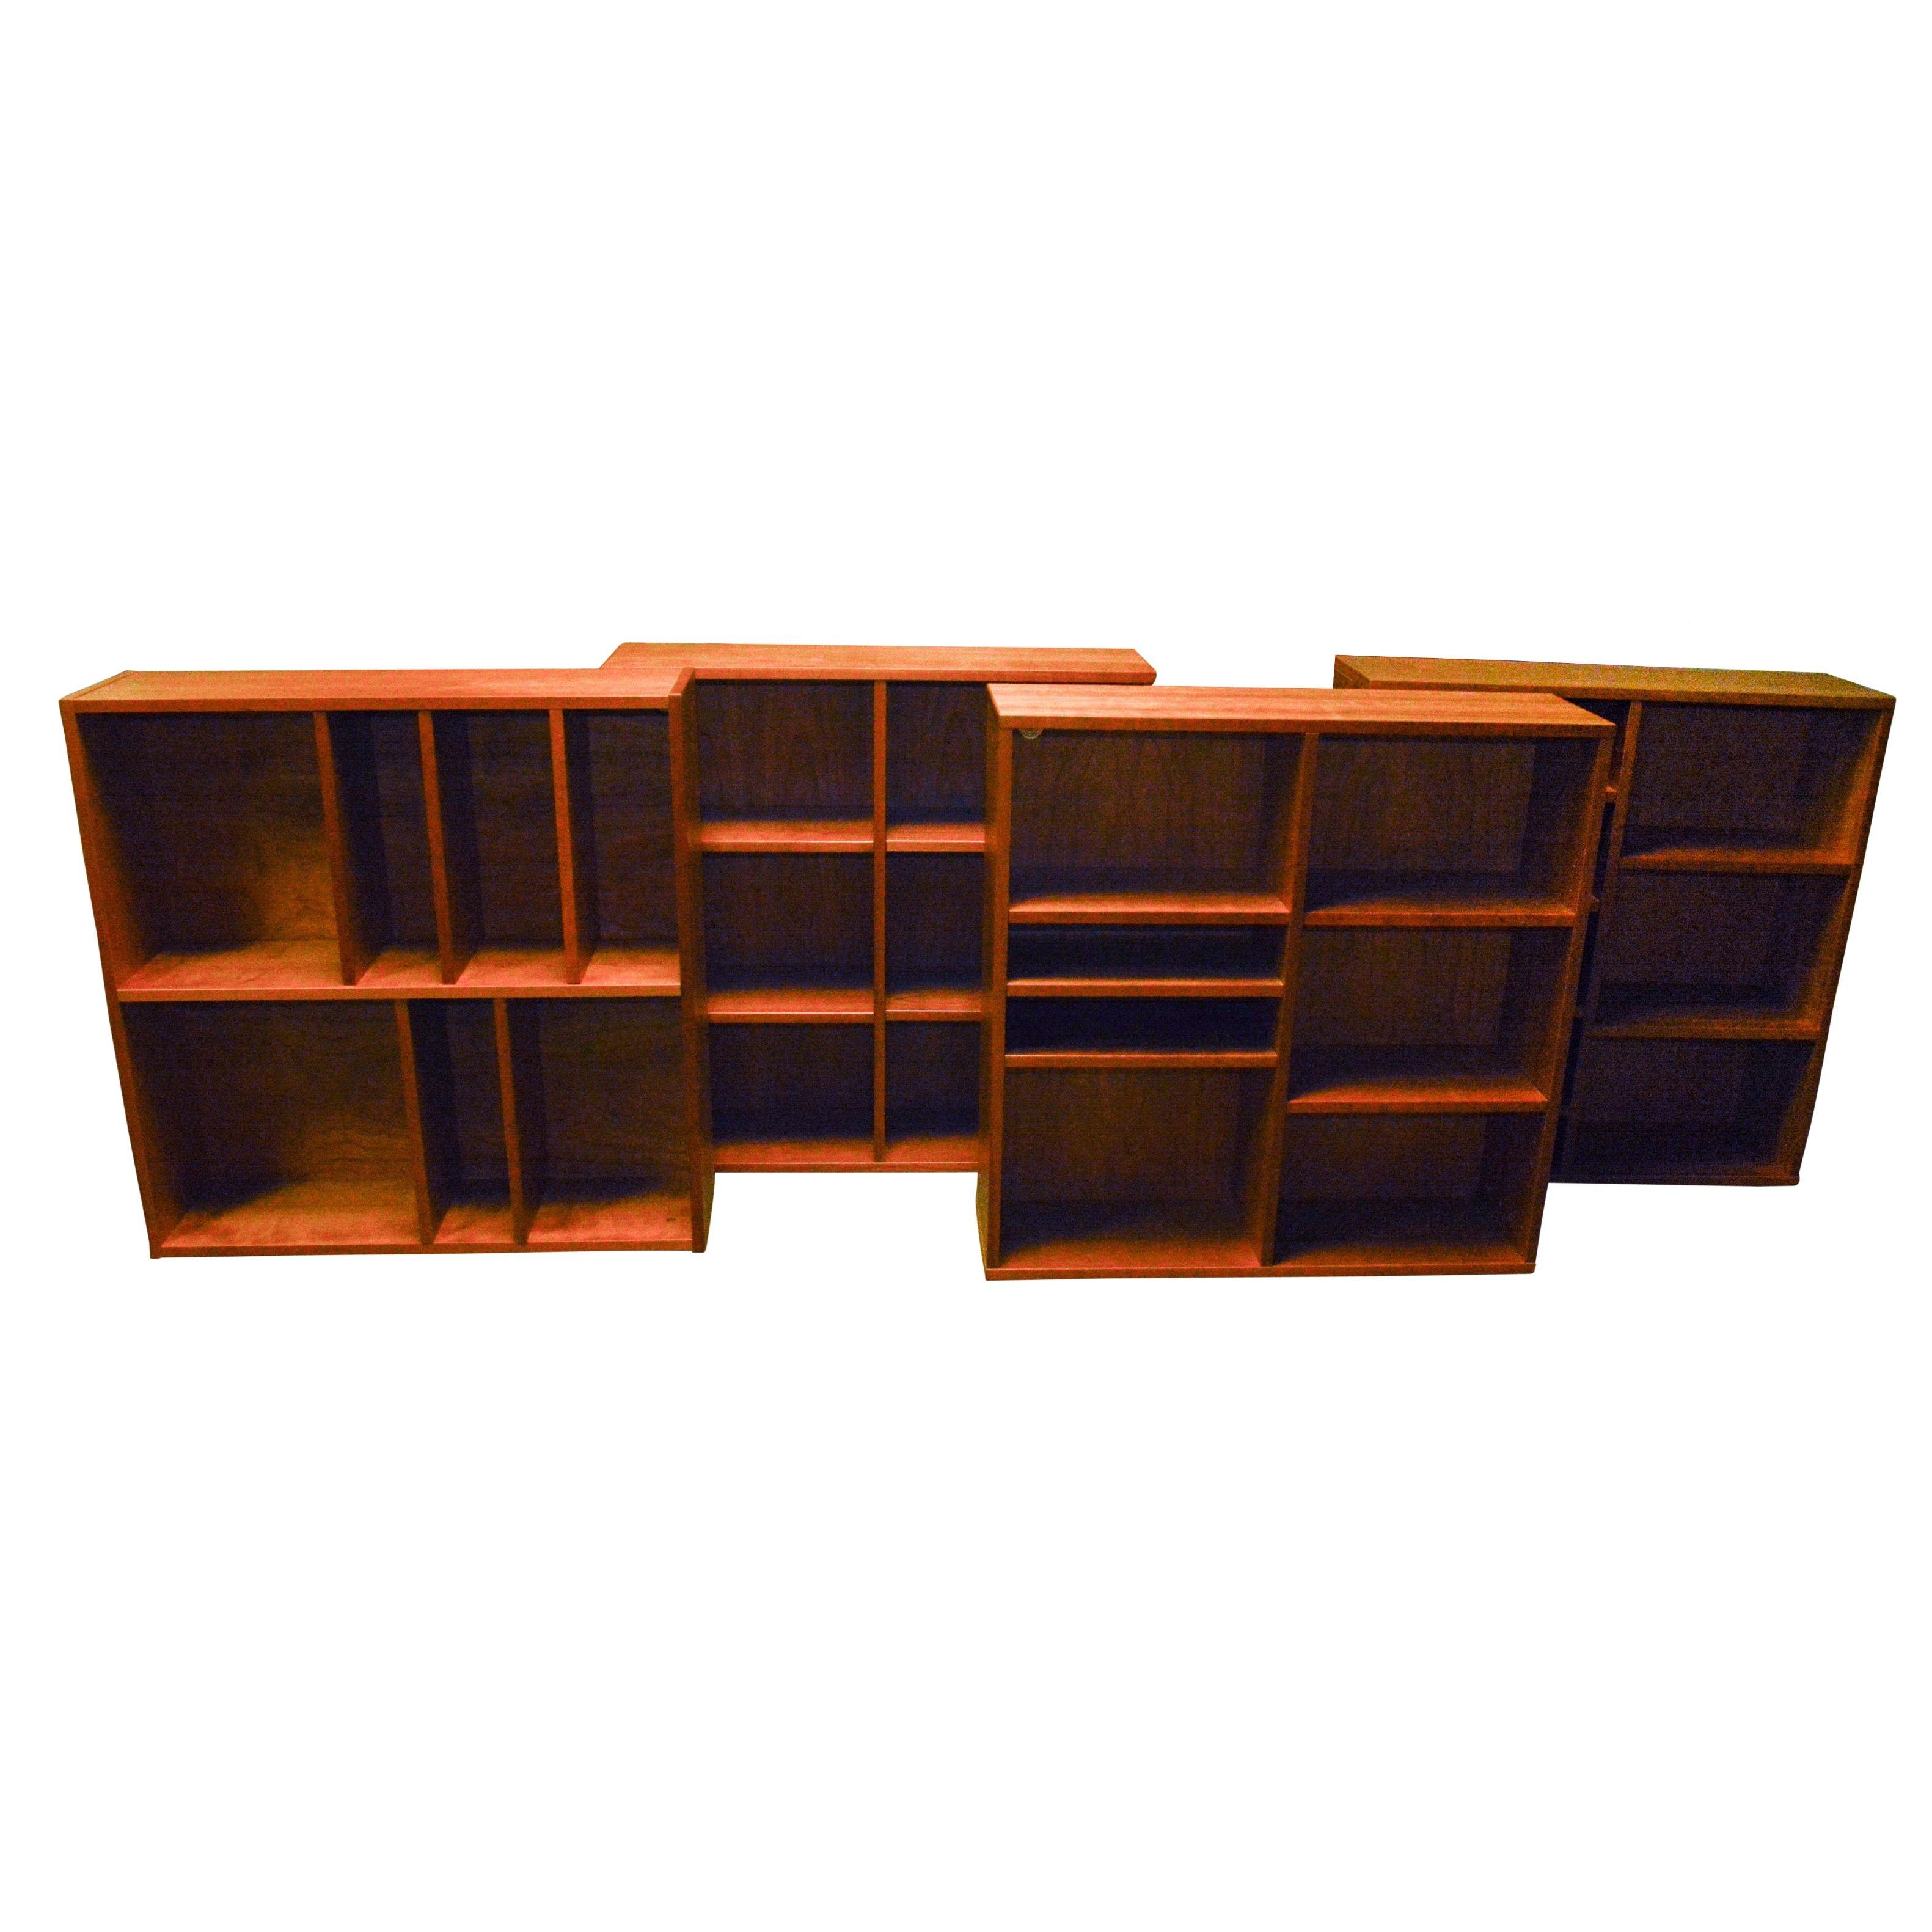 Set of Teak Modular Bookcases